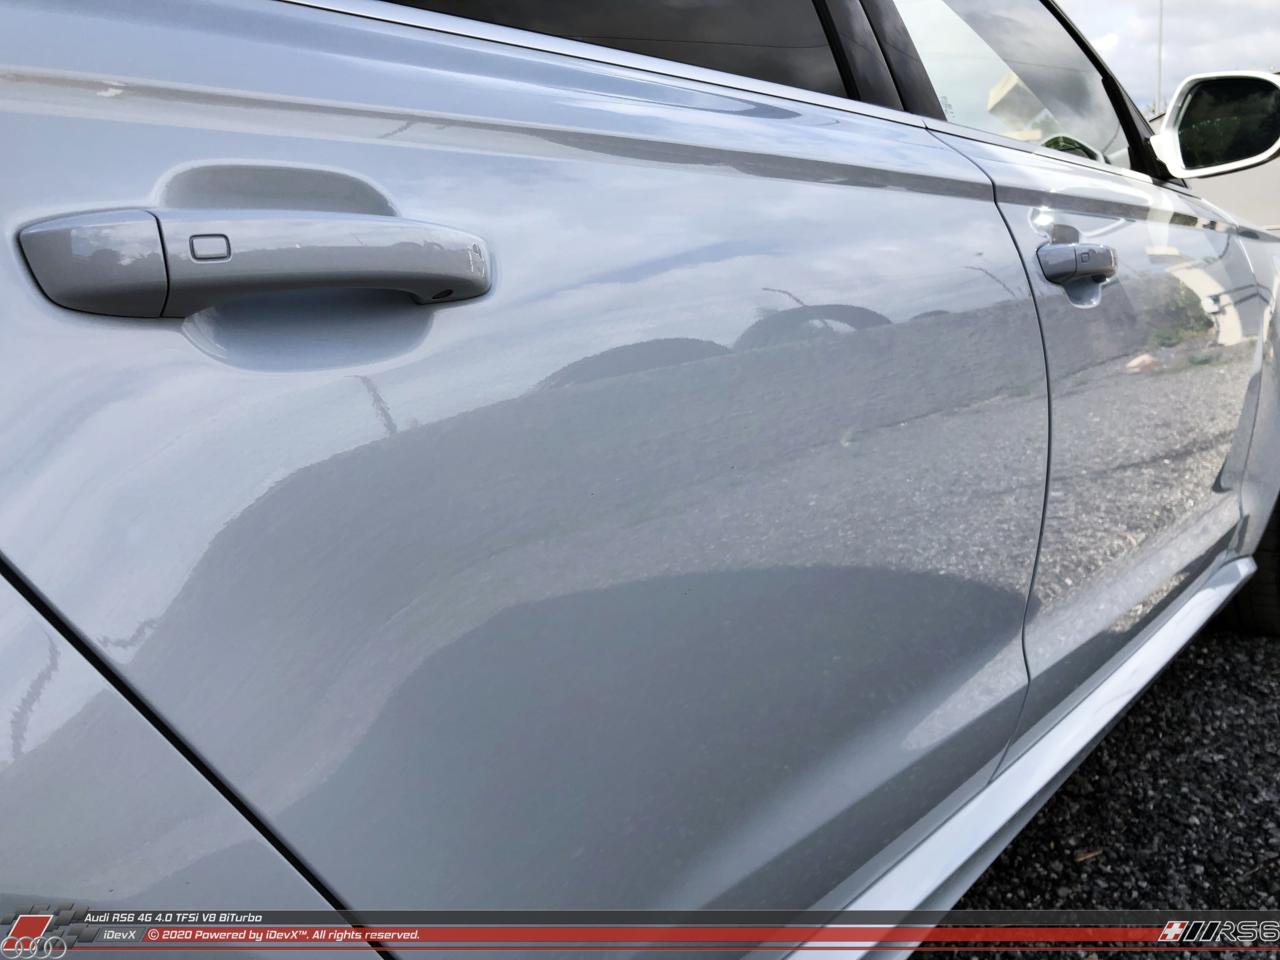 05_08.2019_Audi-RS6_iDevX_050.png